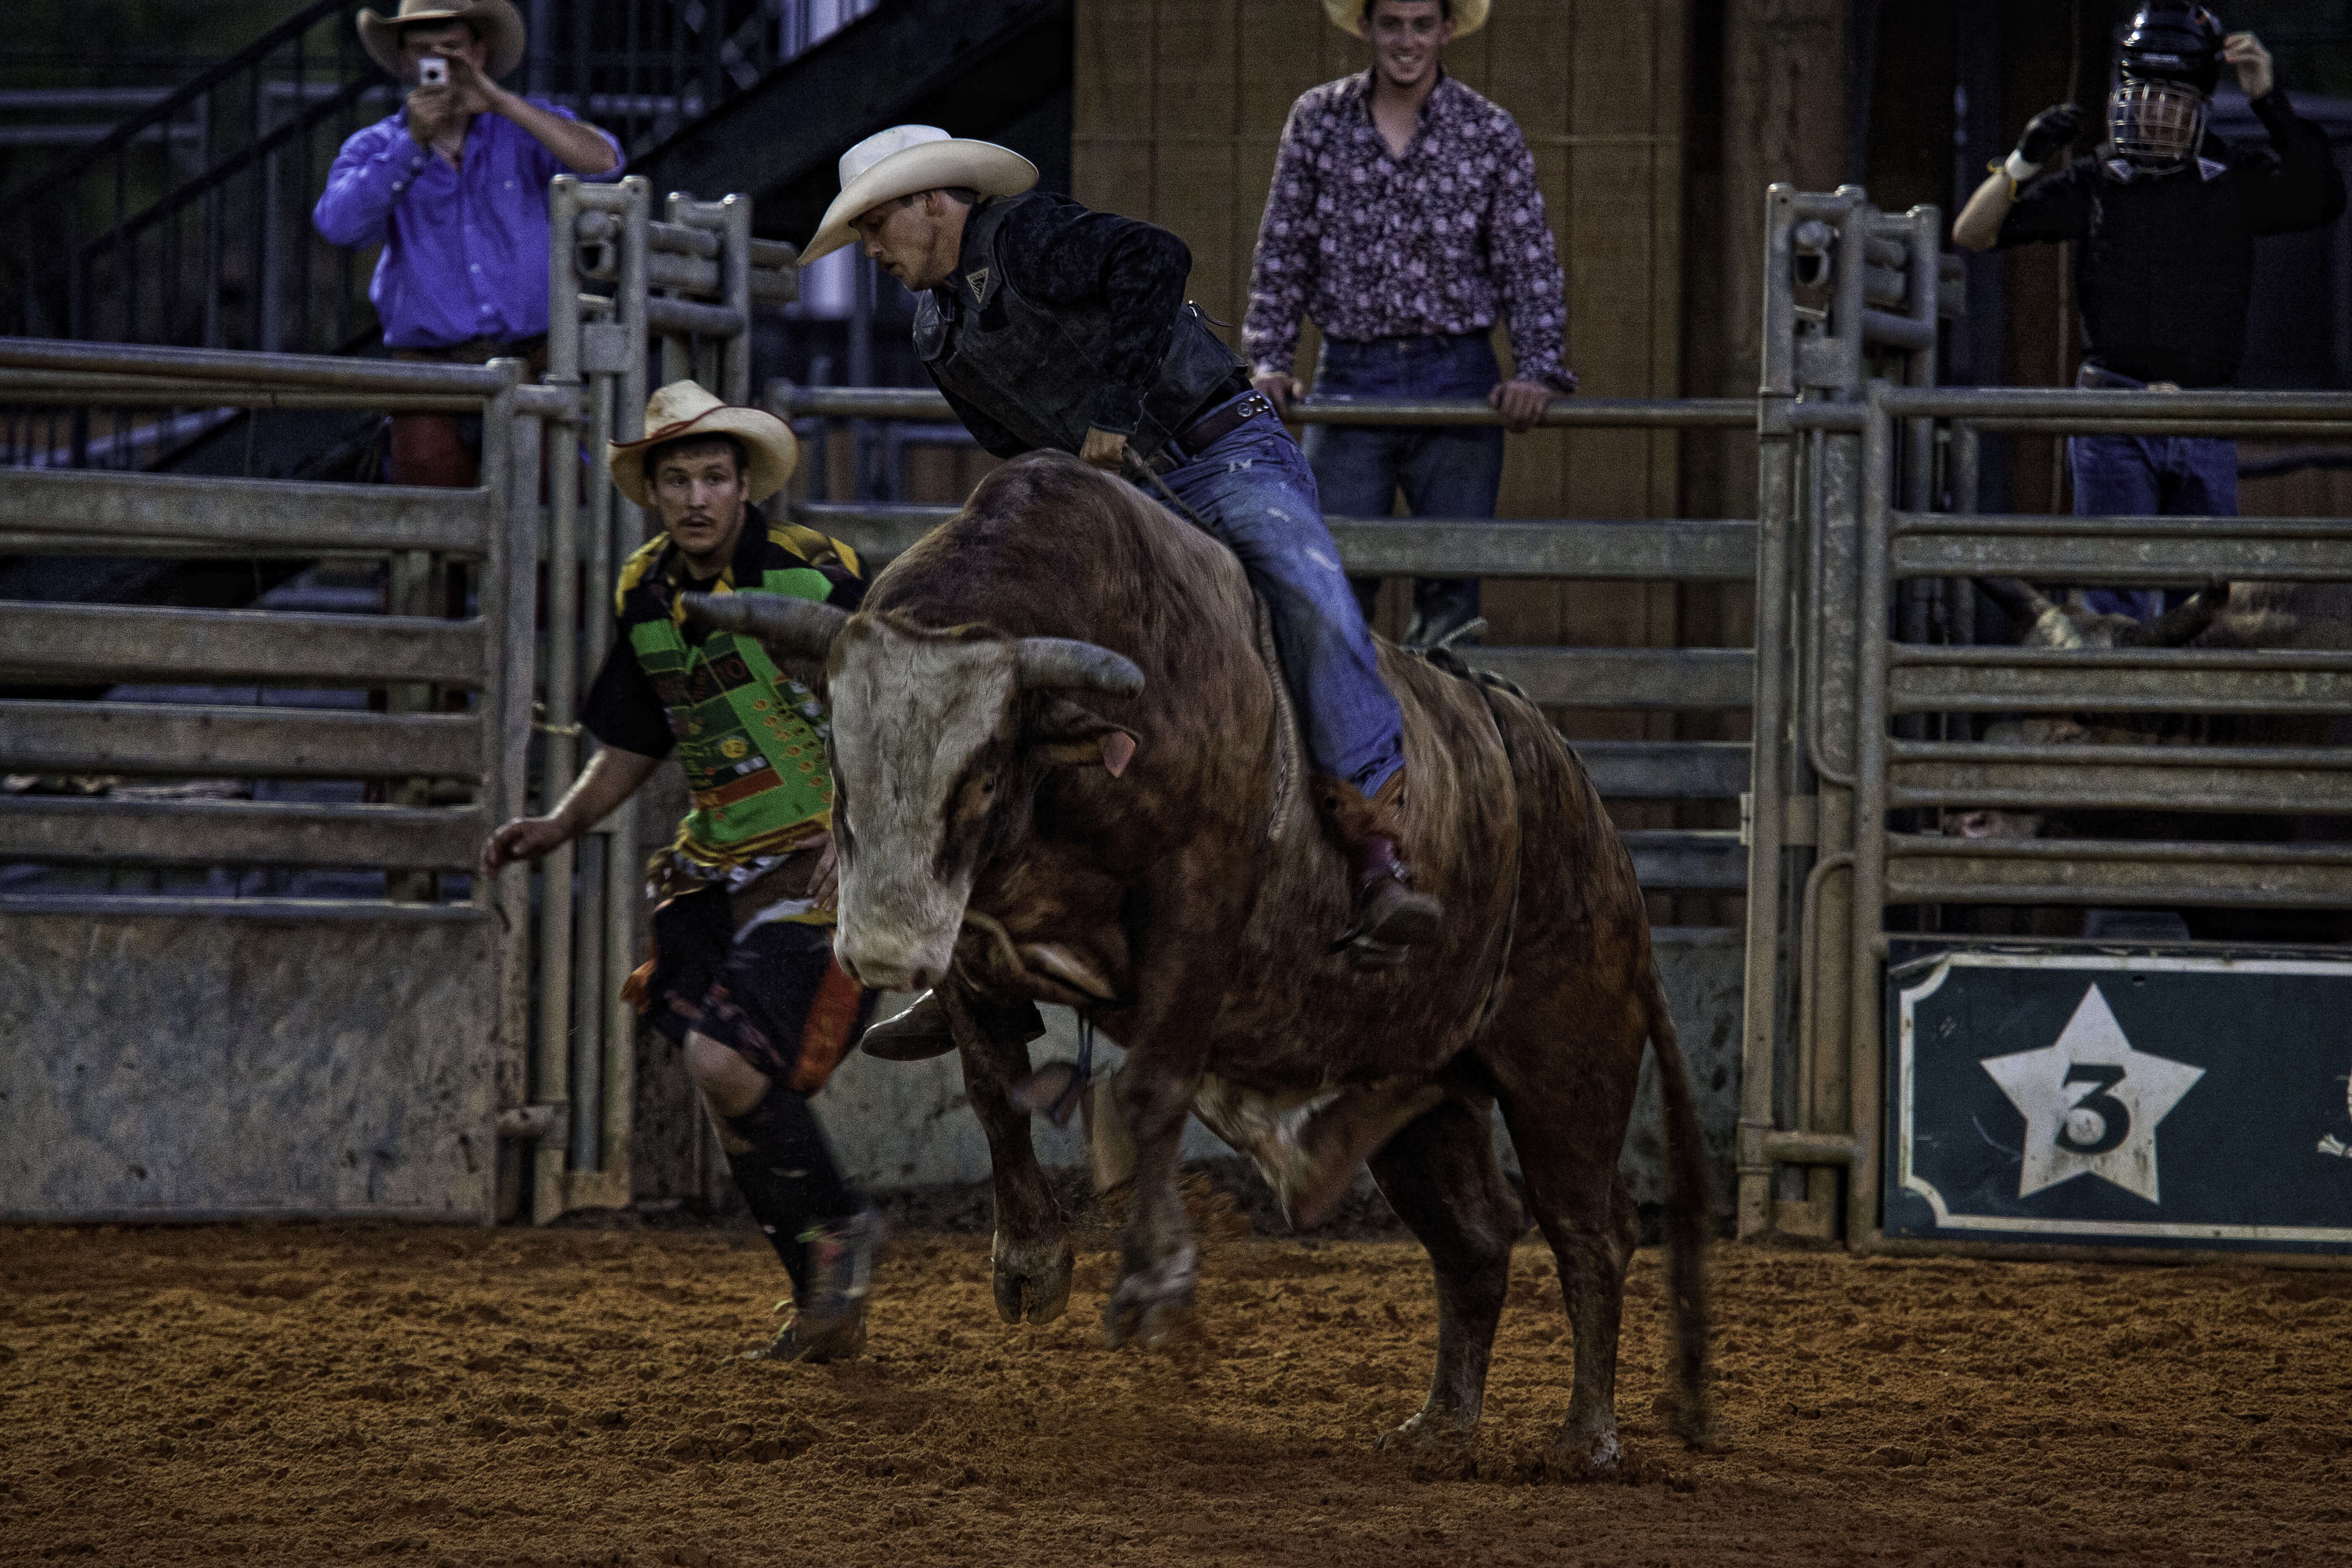 Westgate Rodeo Near Orlando, FL | Westgate River Ranch Resort & Rodeo | Westgate Resorts